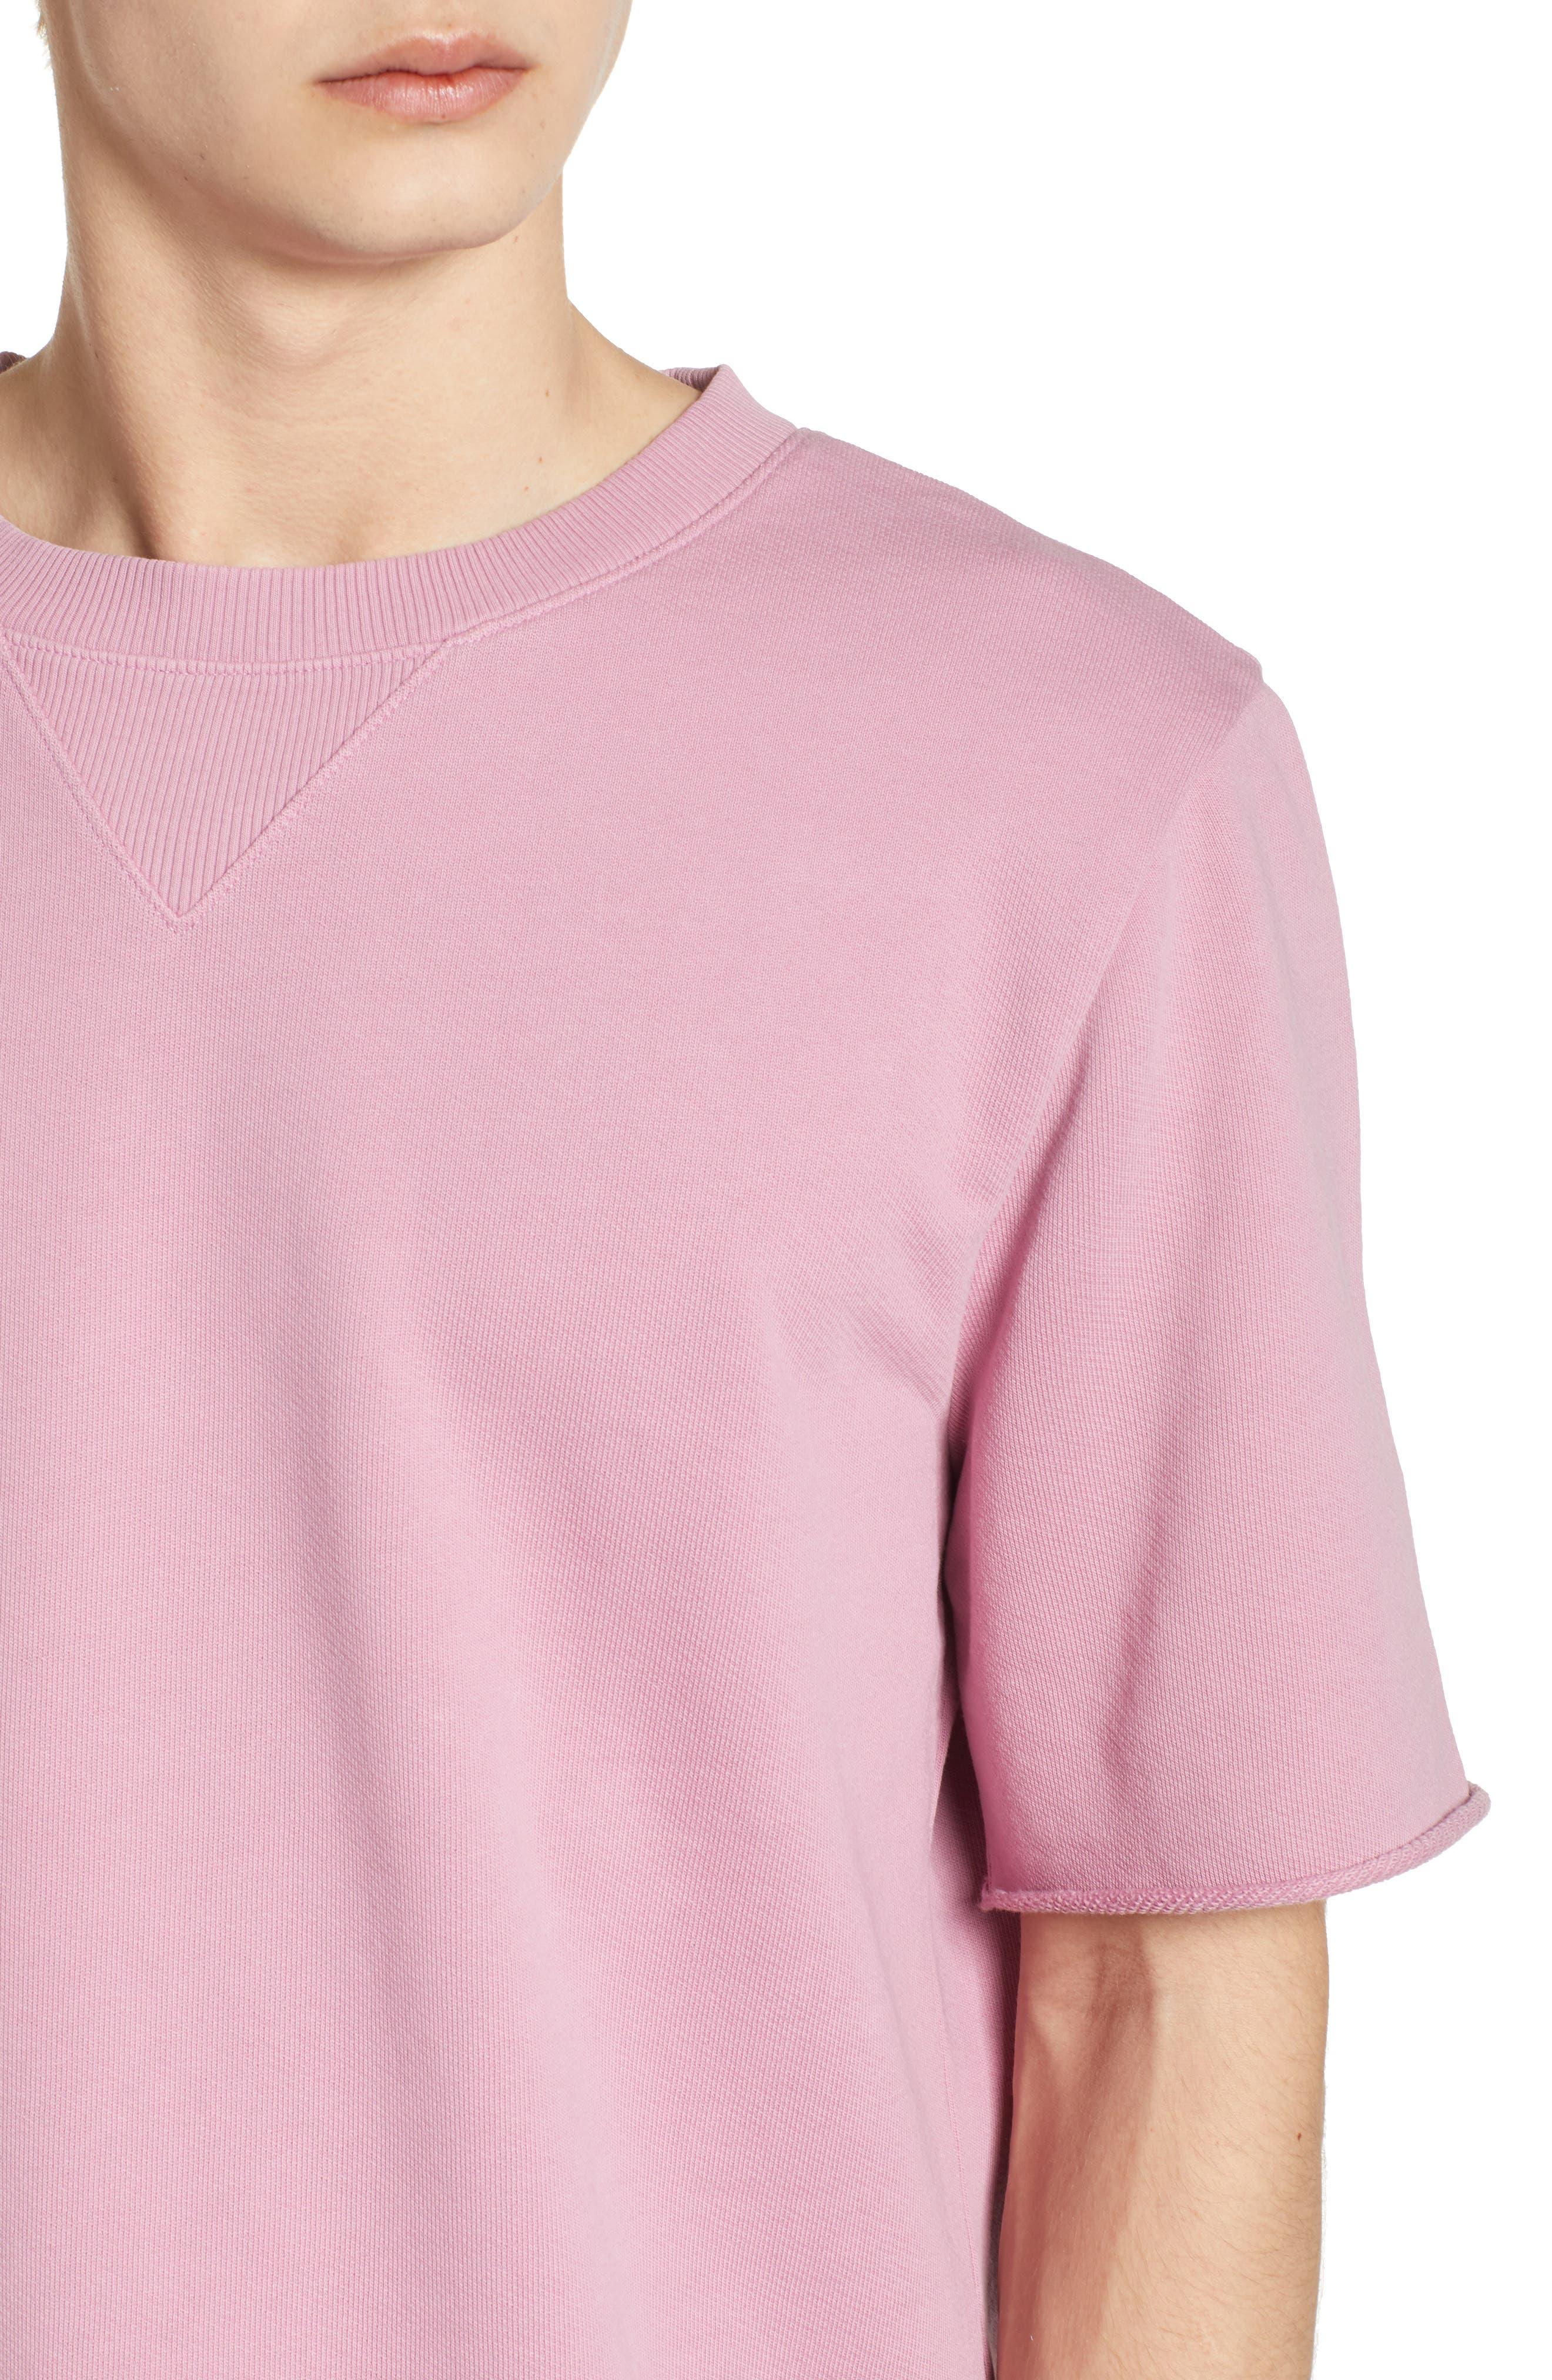 Cotton Terry Sweatshirt,                             Alternate thumbnail 8, color,